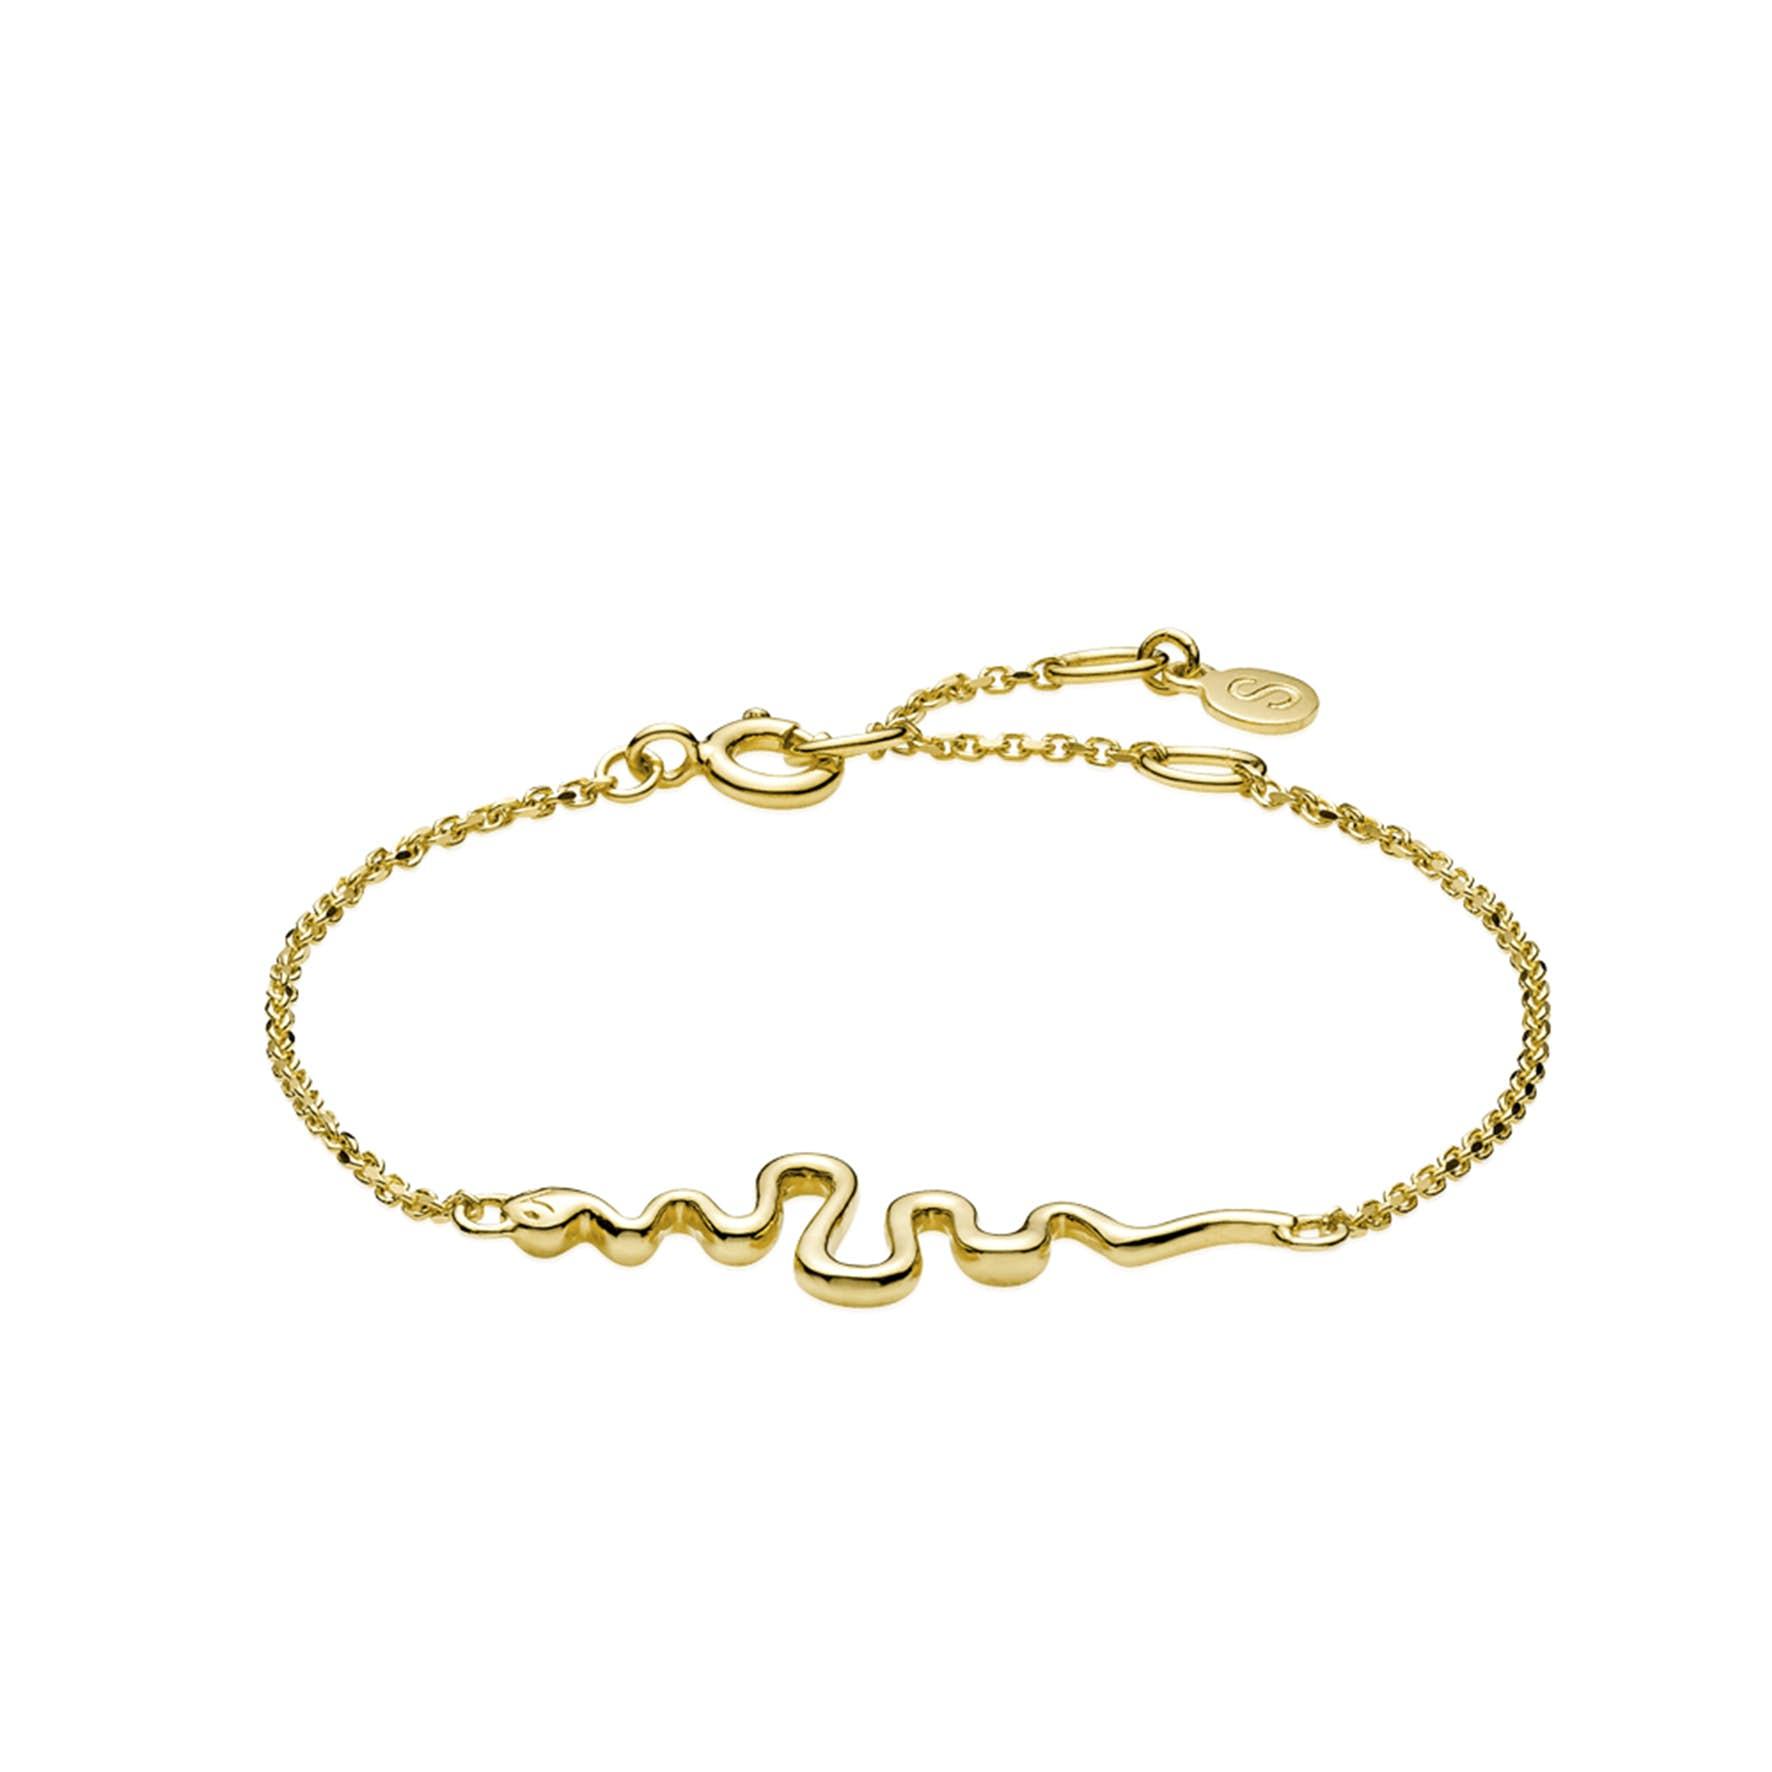 Young One Snake Bracelet von Sistie in Vergoldet-Silber Sterling 925